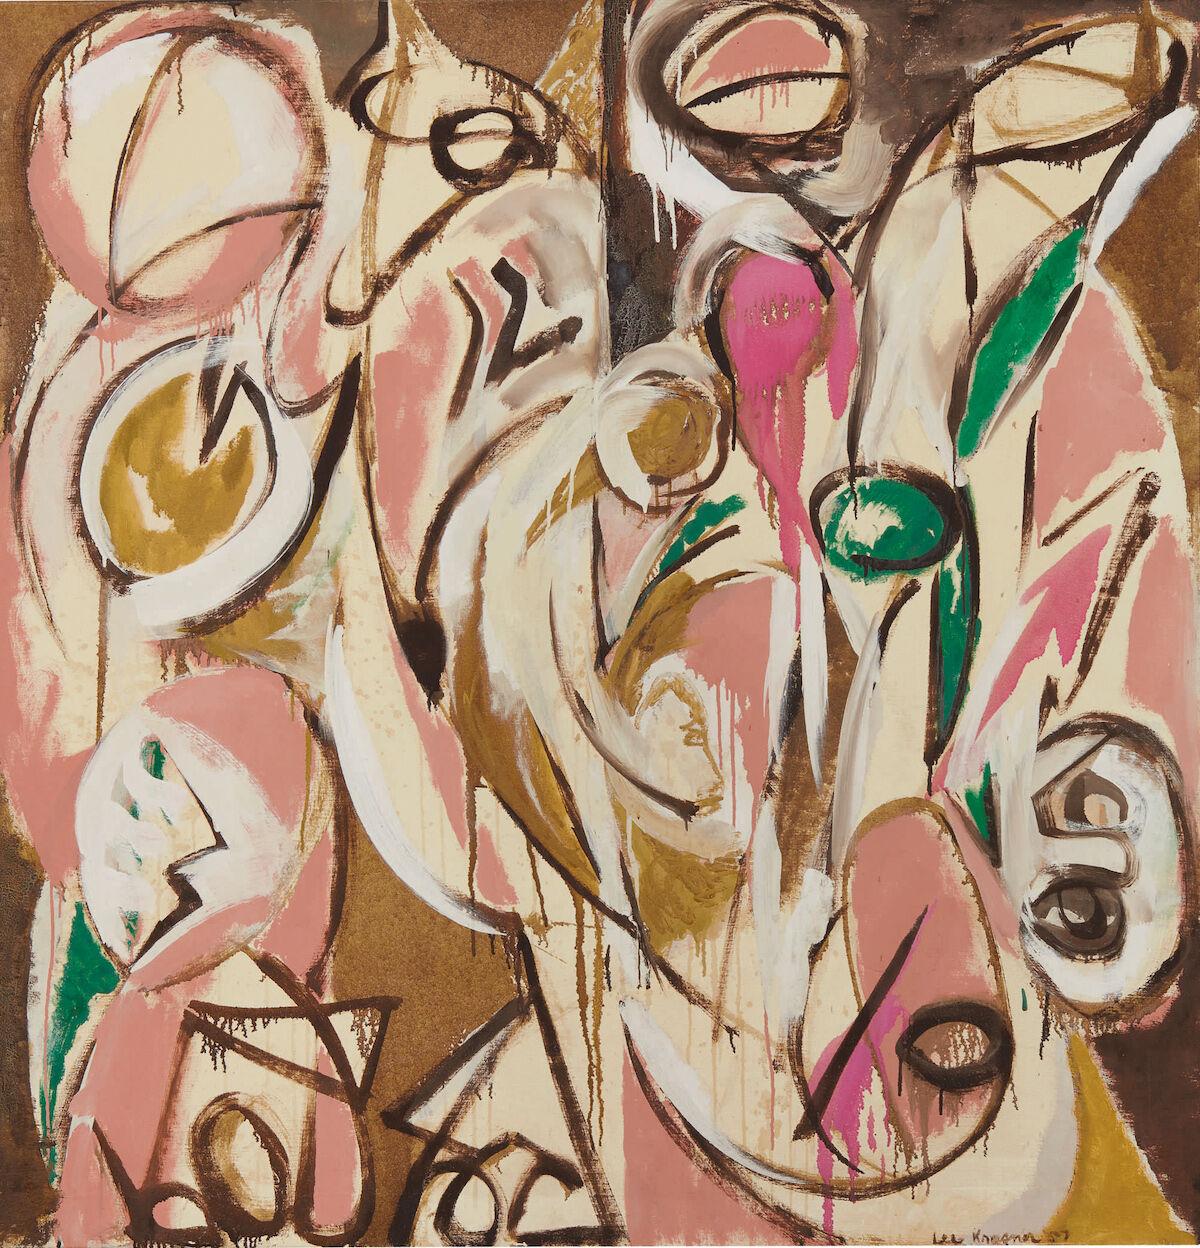 Lee Krasner, Re-Echo, 1957. Est. $4 million–$6 million. Courtesy Sotheby's